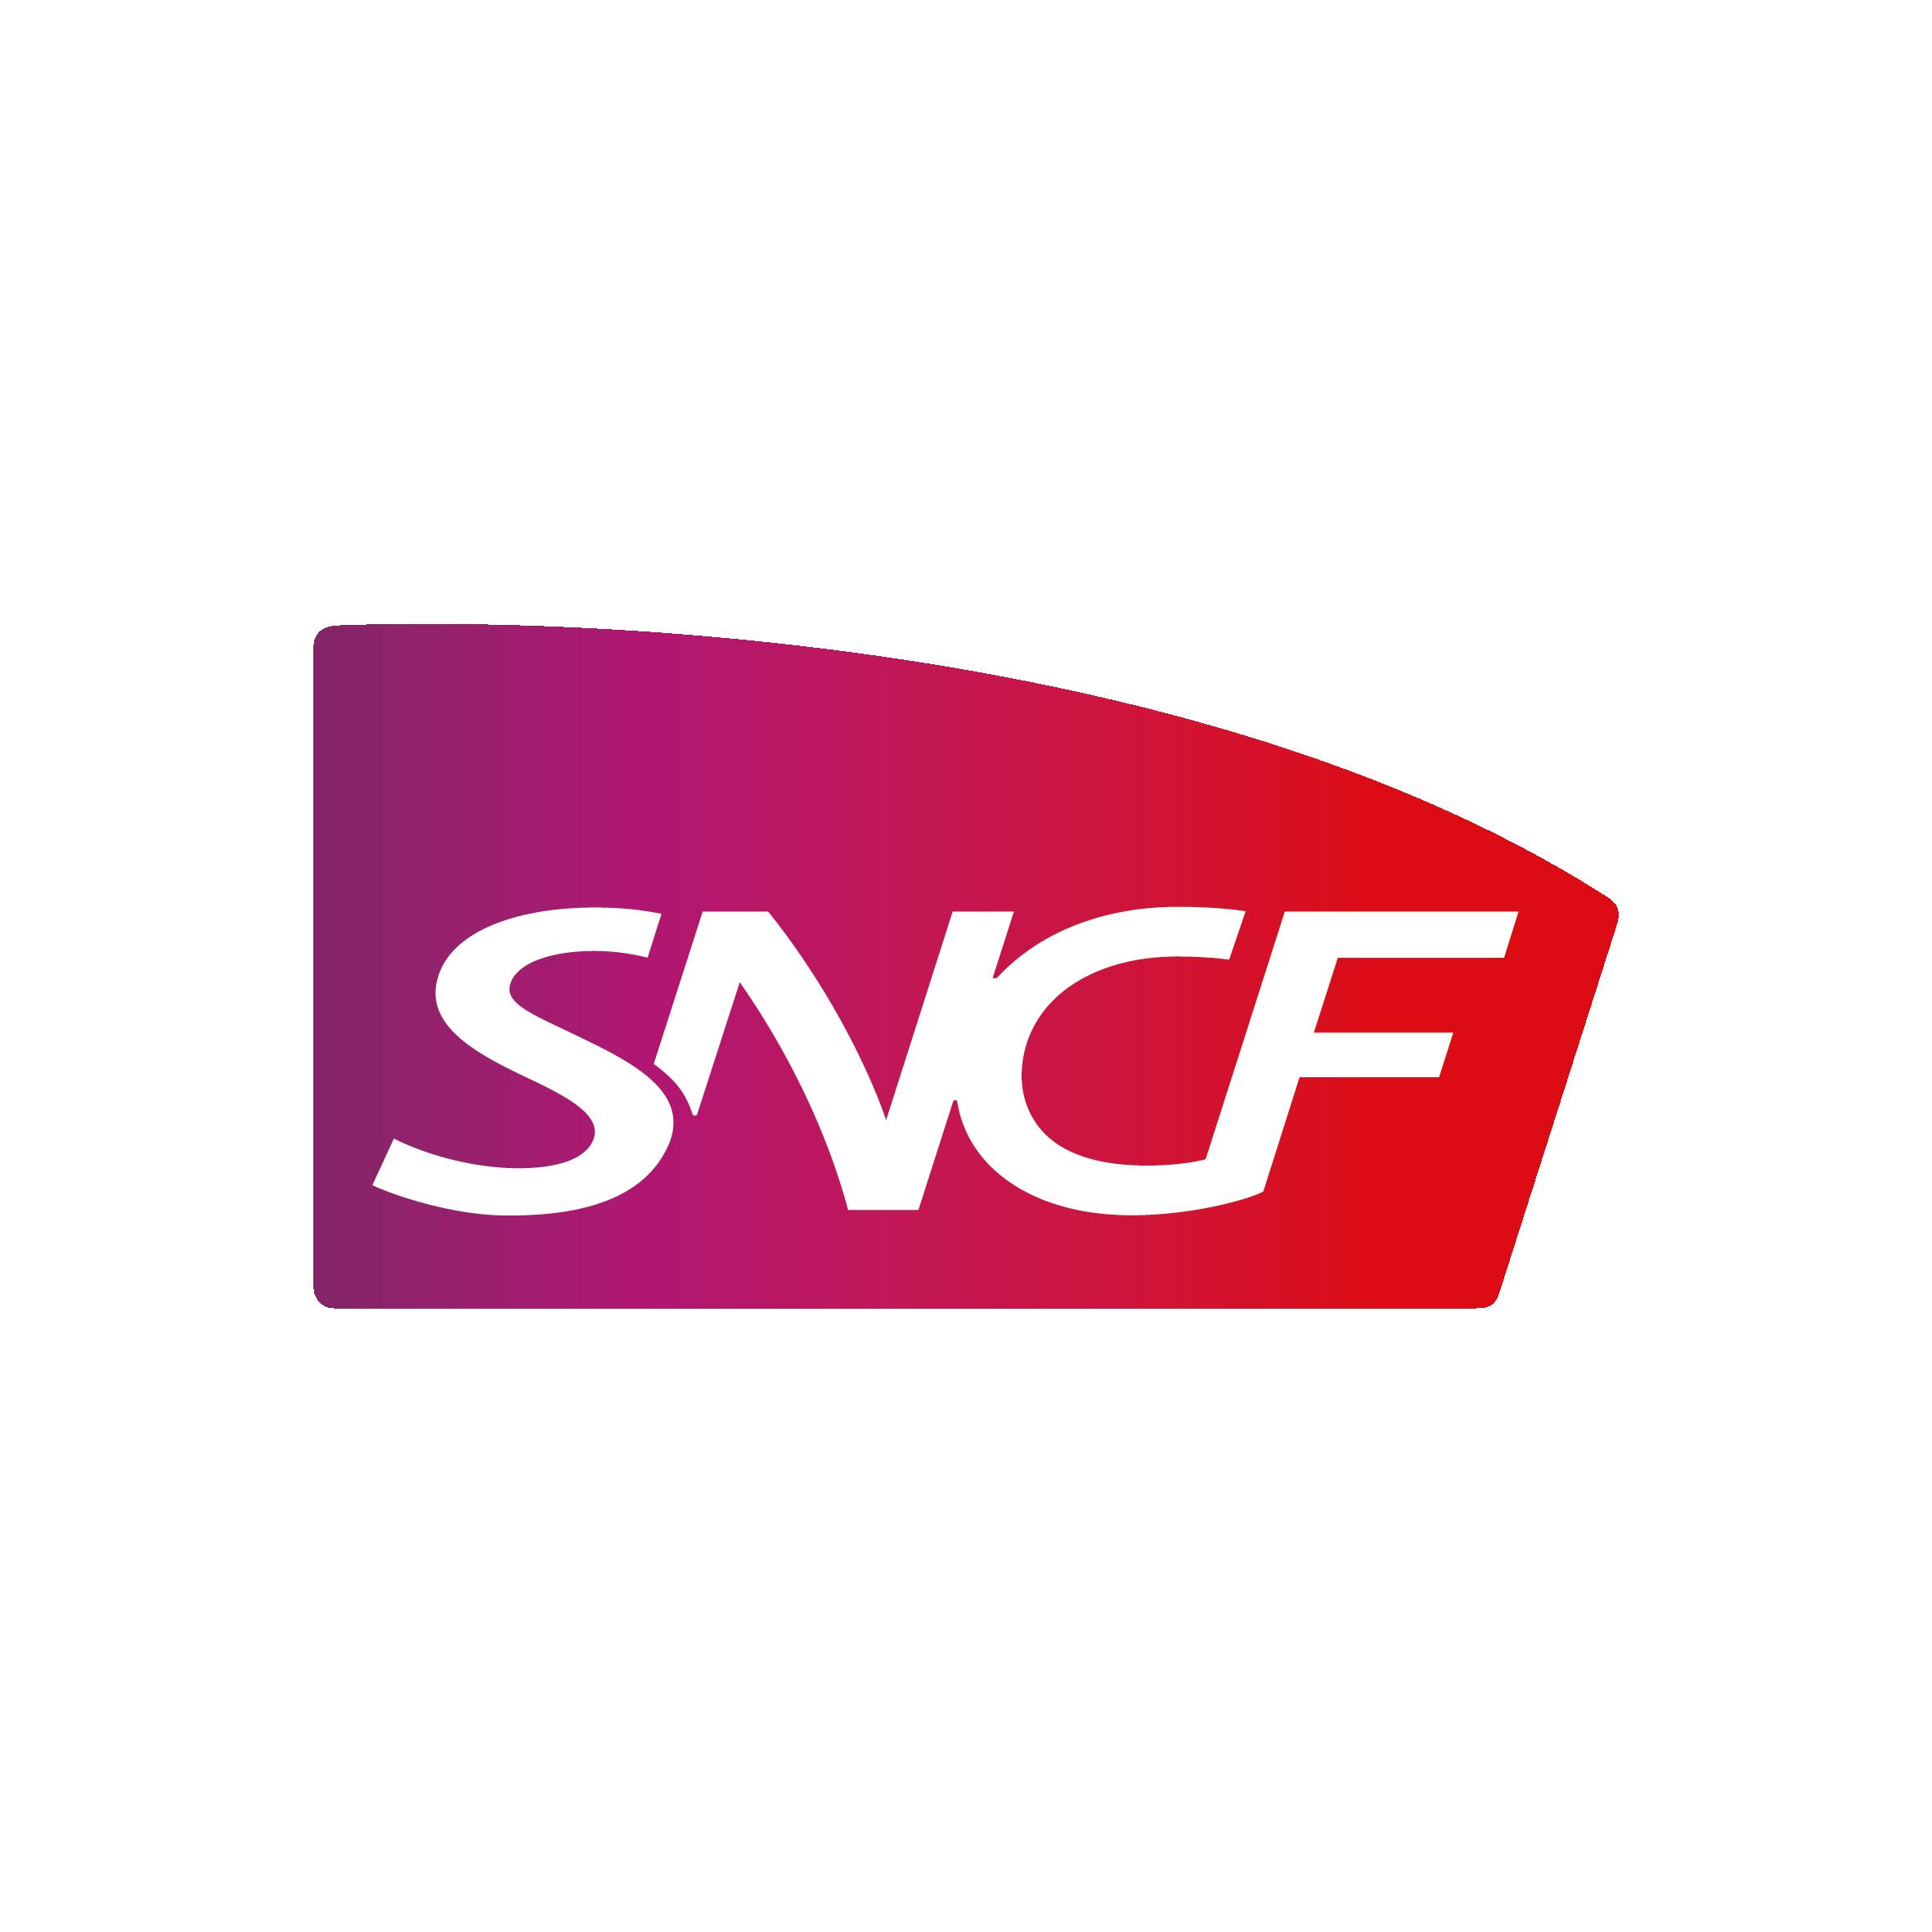 LOGO_SNCF_GROUPE_RVB.png